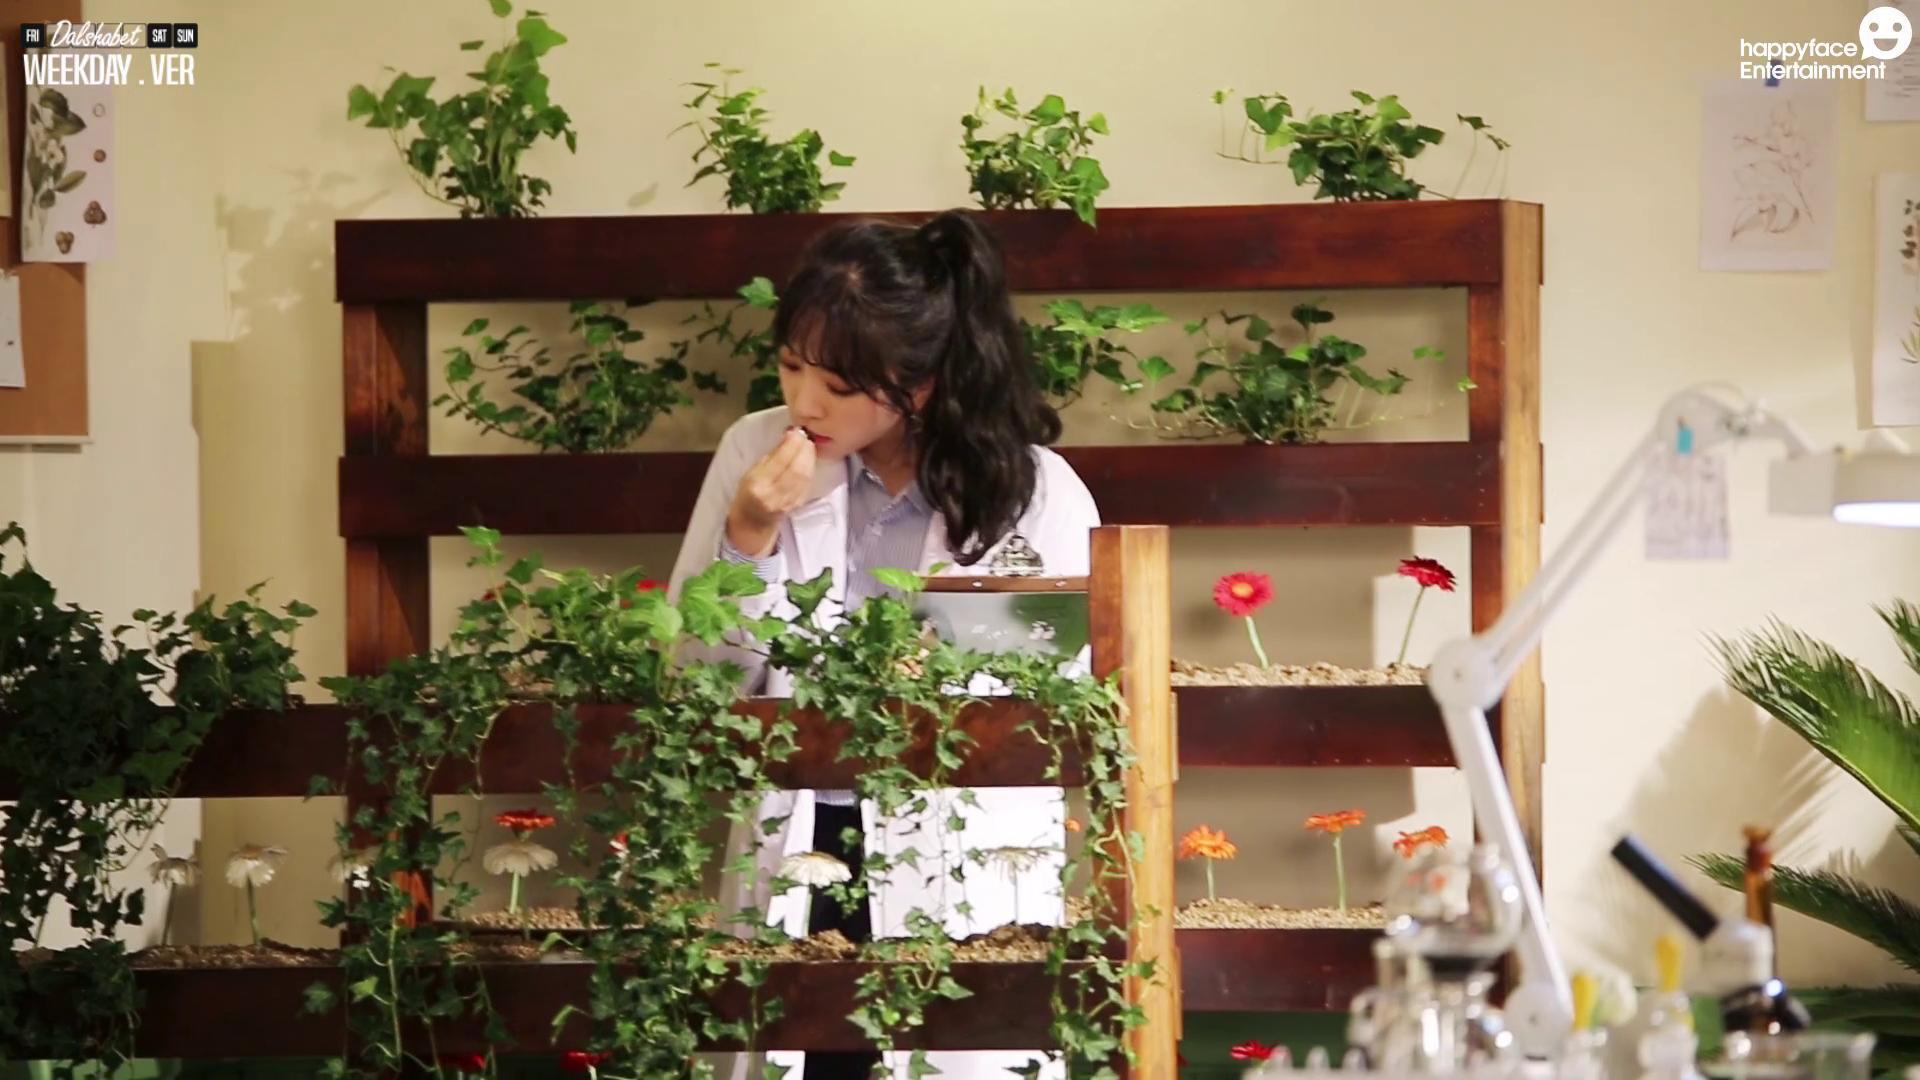 [Making] 달샤벳 '금토일' 뮤직비디오 비하인드(Weekday Ver.)